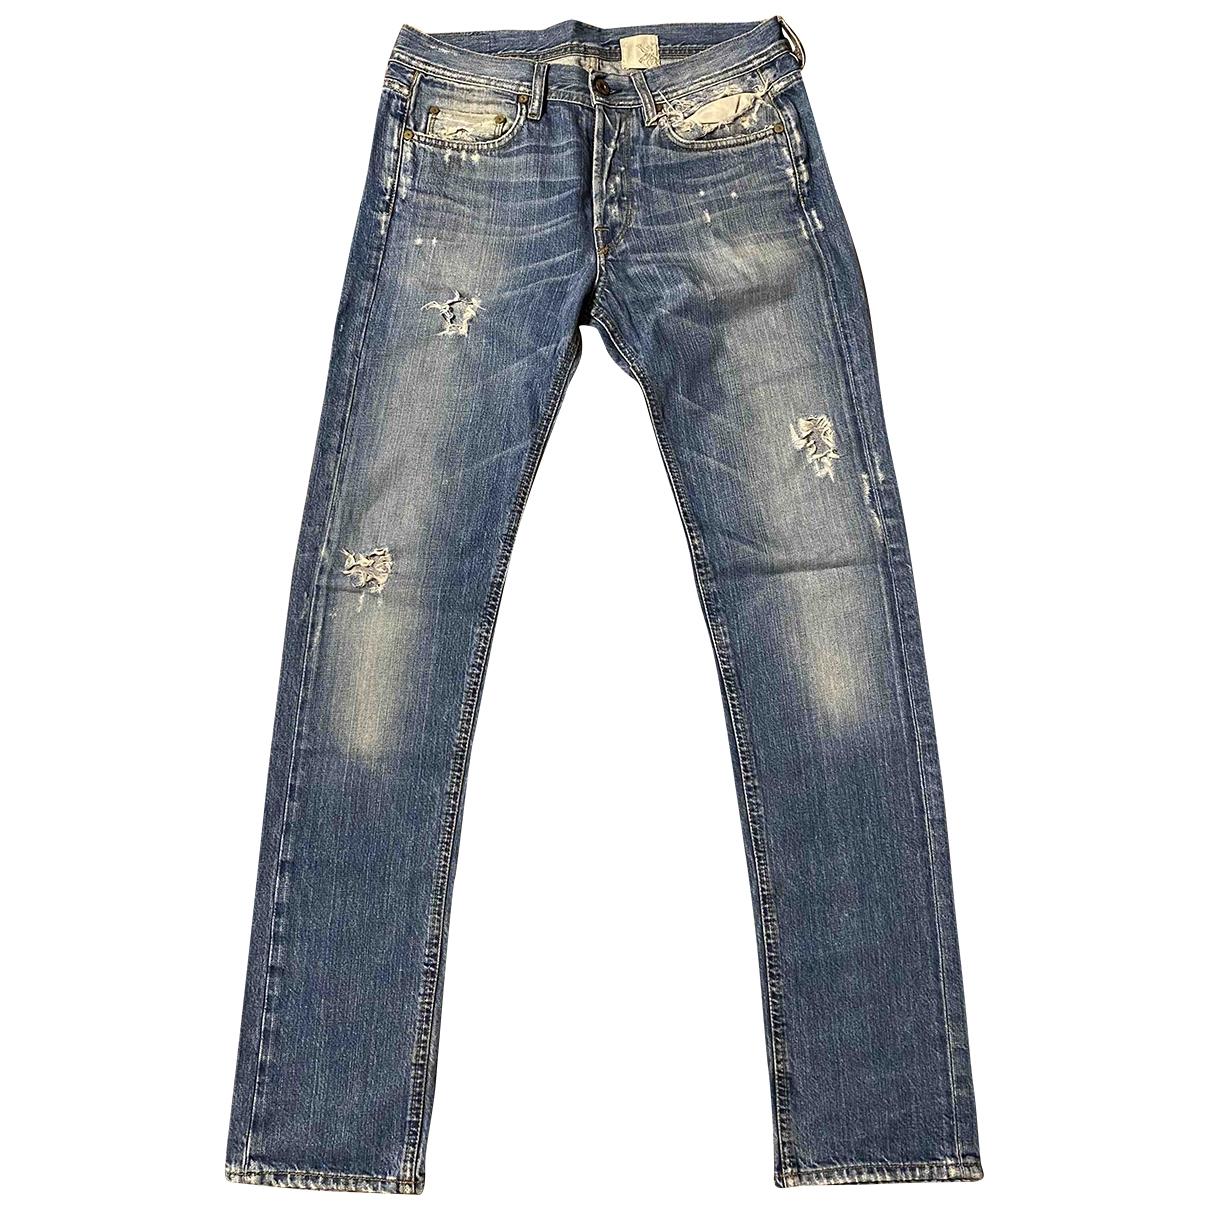 Mauro Grifoni \N Cotton Jeans for Men 30 US